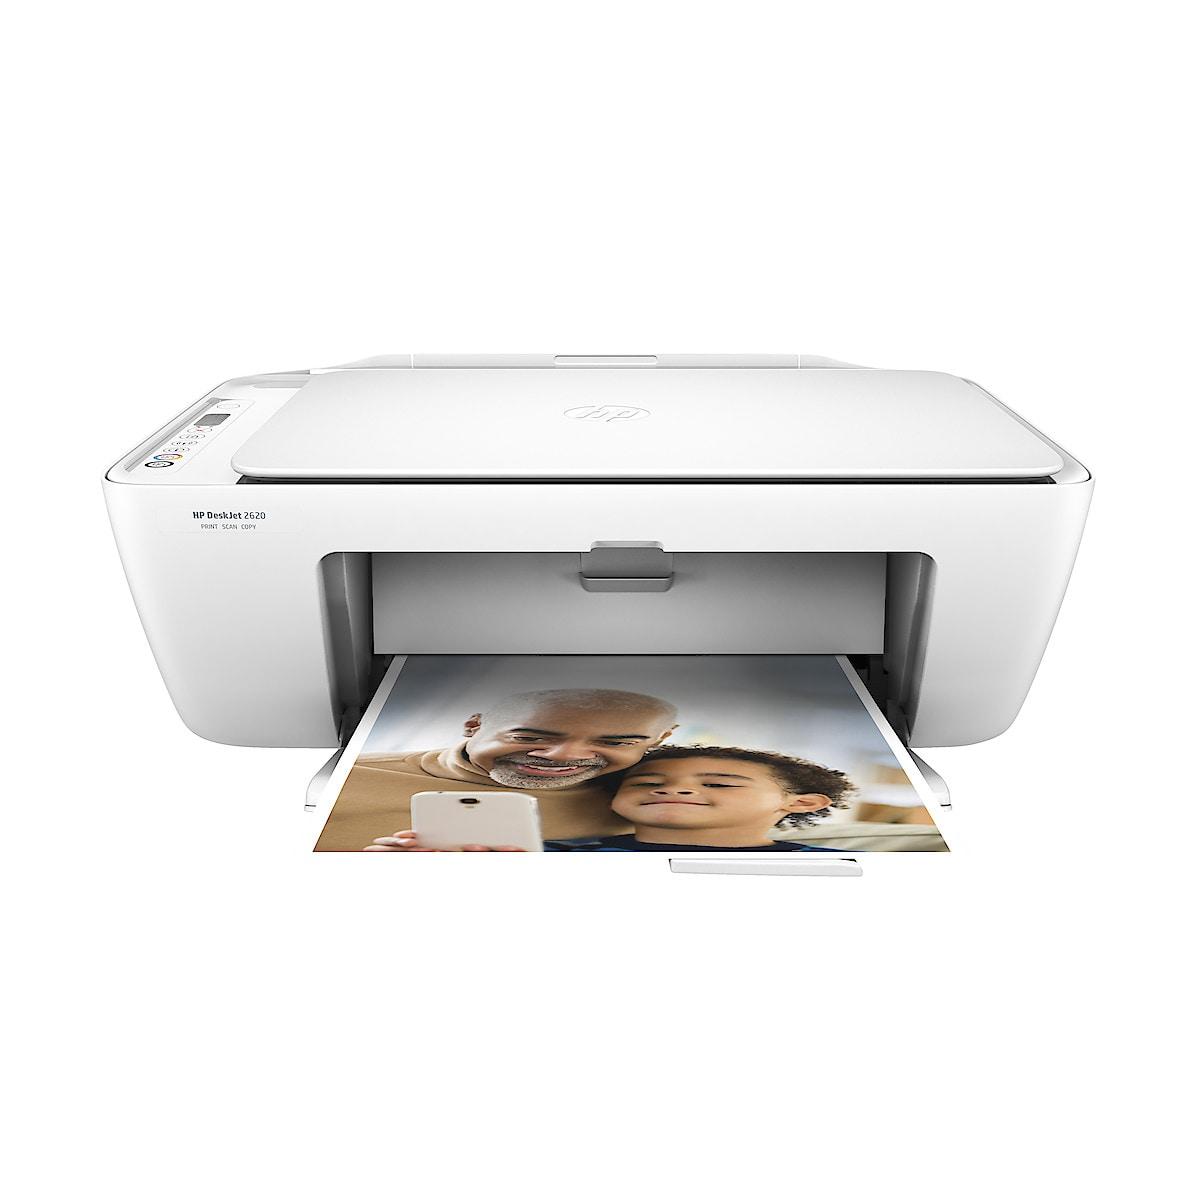 HP DeskJet 2620 AiO skrivare